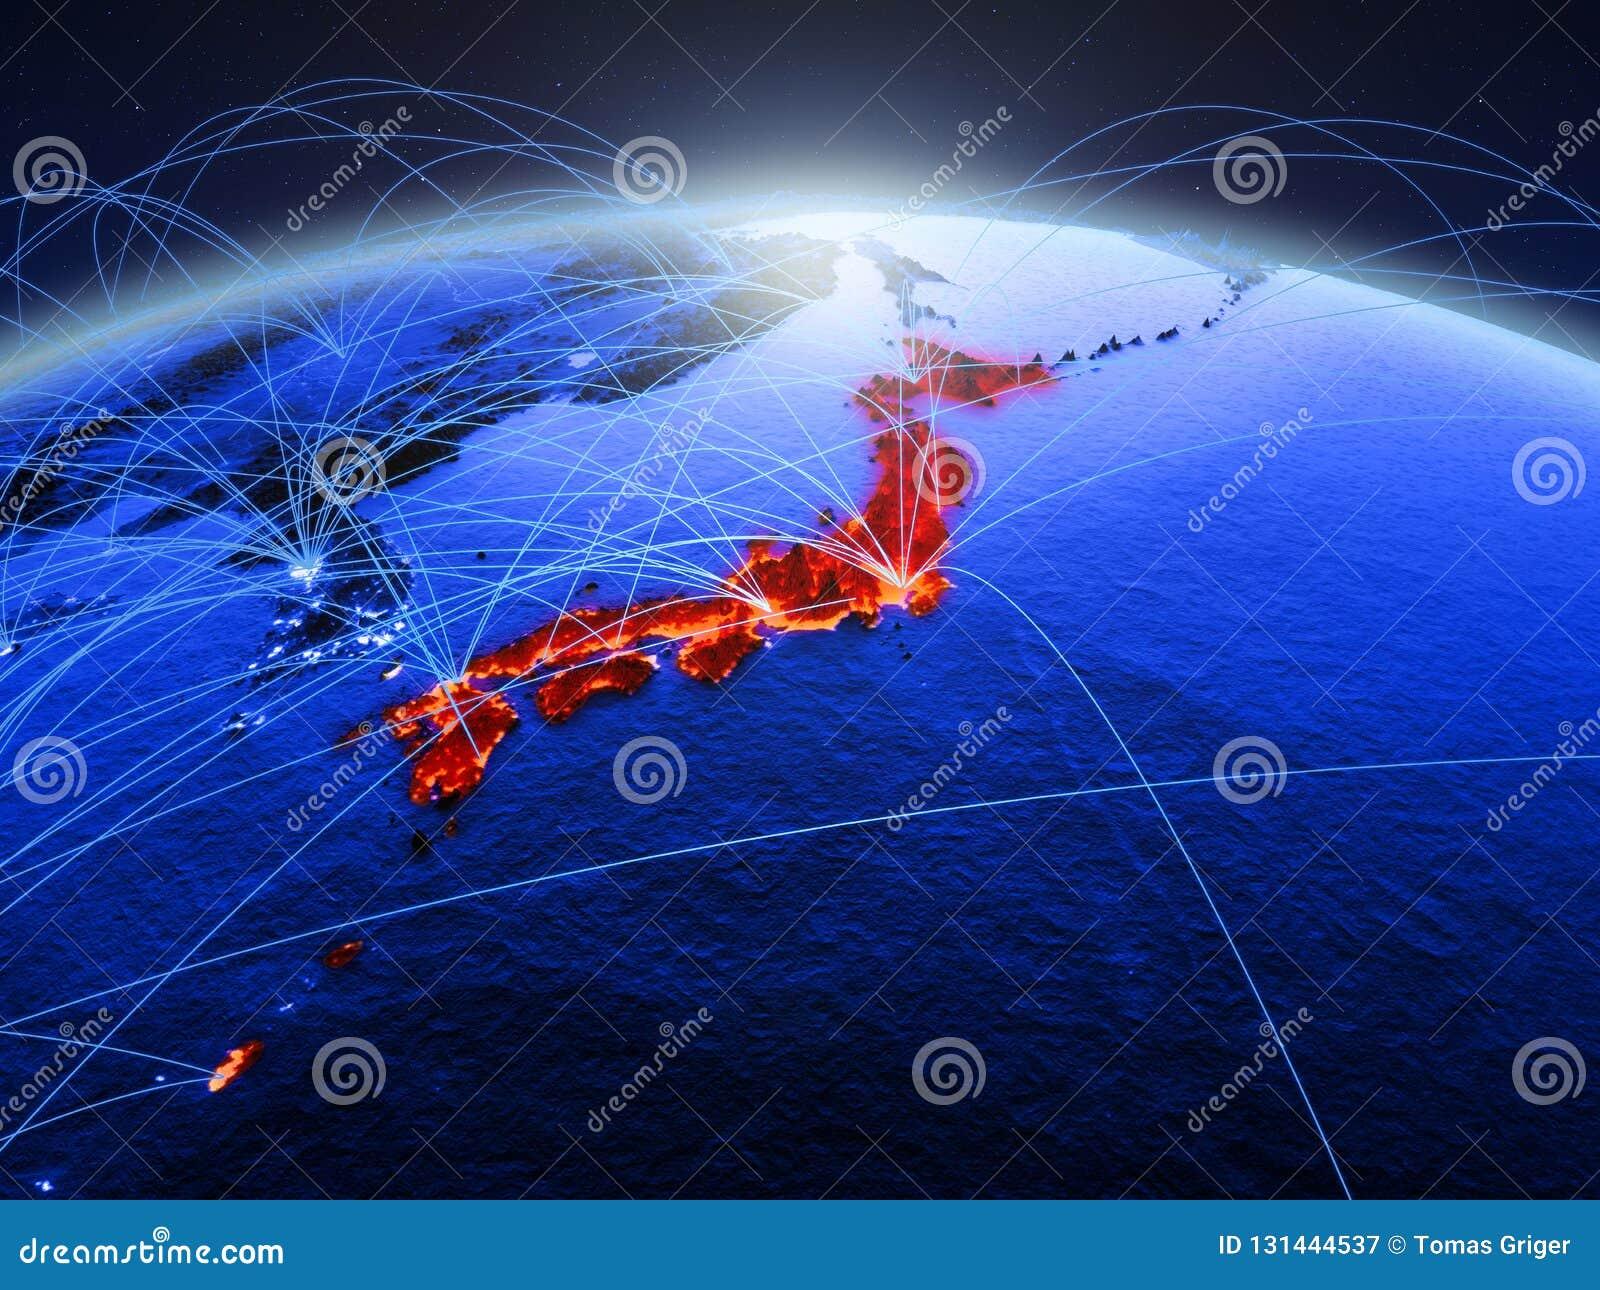 Japan op blauwe digitale aarde met internationaal netwerk die mededeling, reis en verbindingen vertegenwoordigen 3D Illustratie